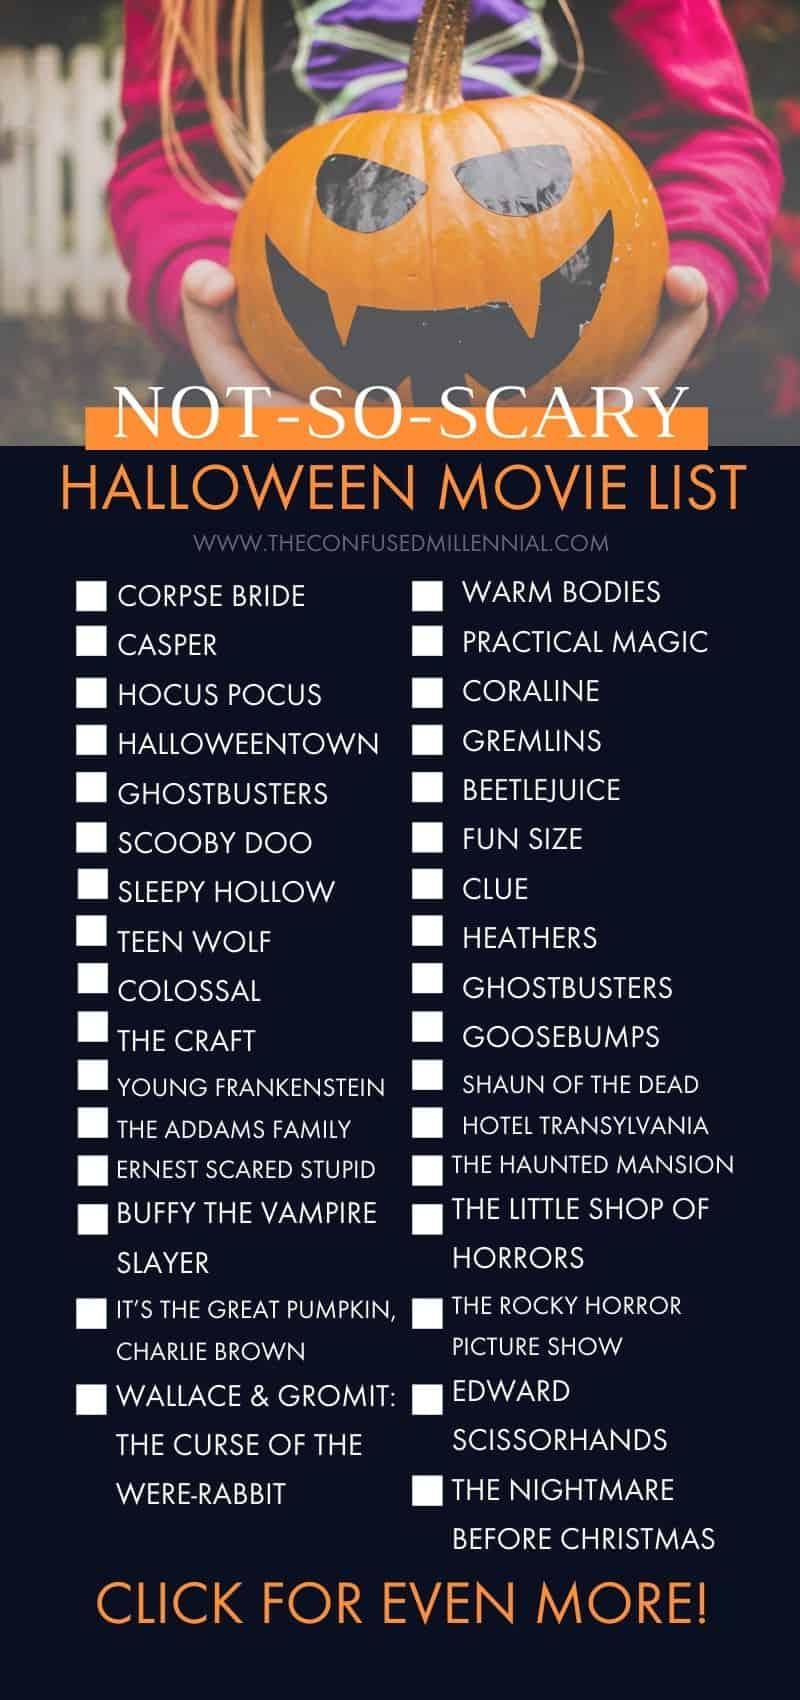 halloween movies to watch, #halloweenmovies, spooky movies, not so scary halloween movies